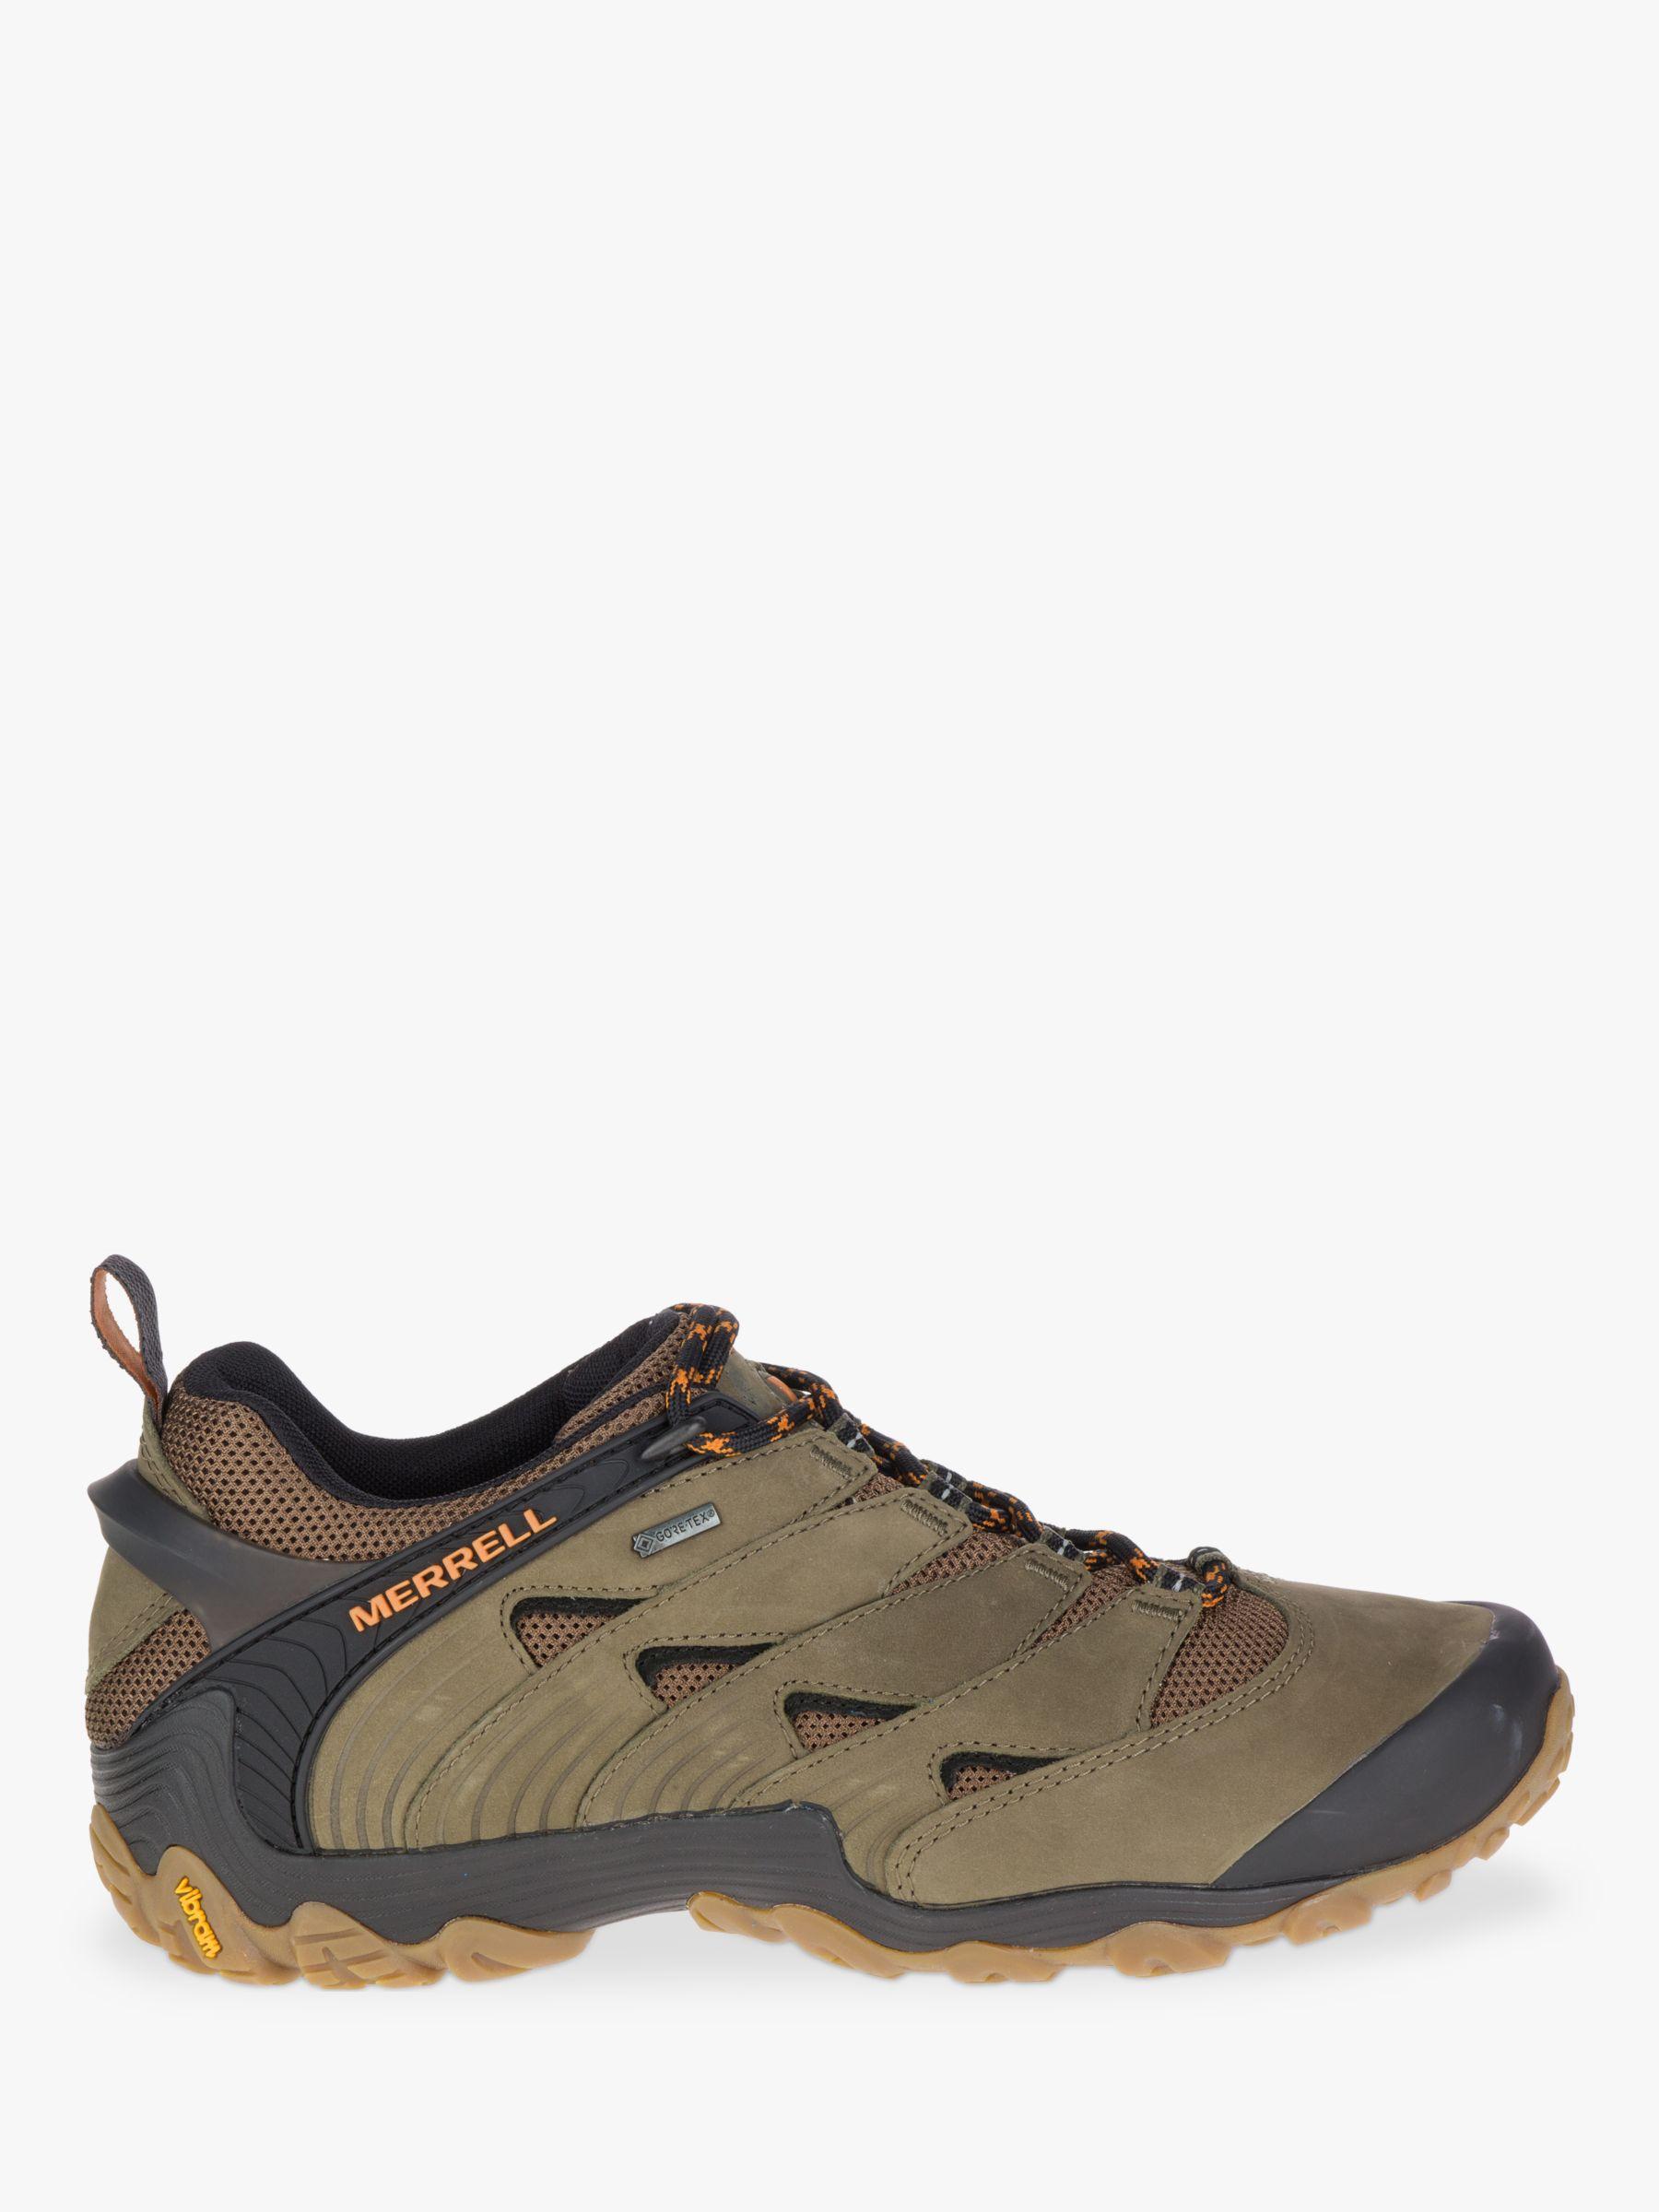 Merrell Merrell Chameleon 7 Men's Waterproof Gore-Tex Hiking Shoes, Taupe